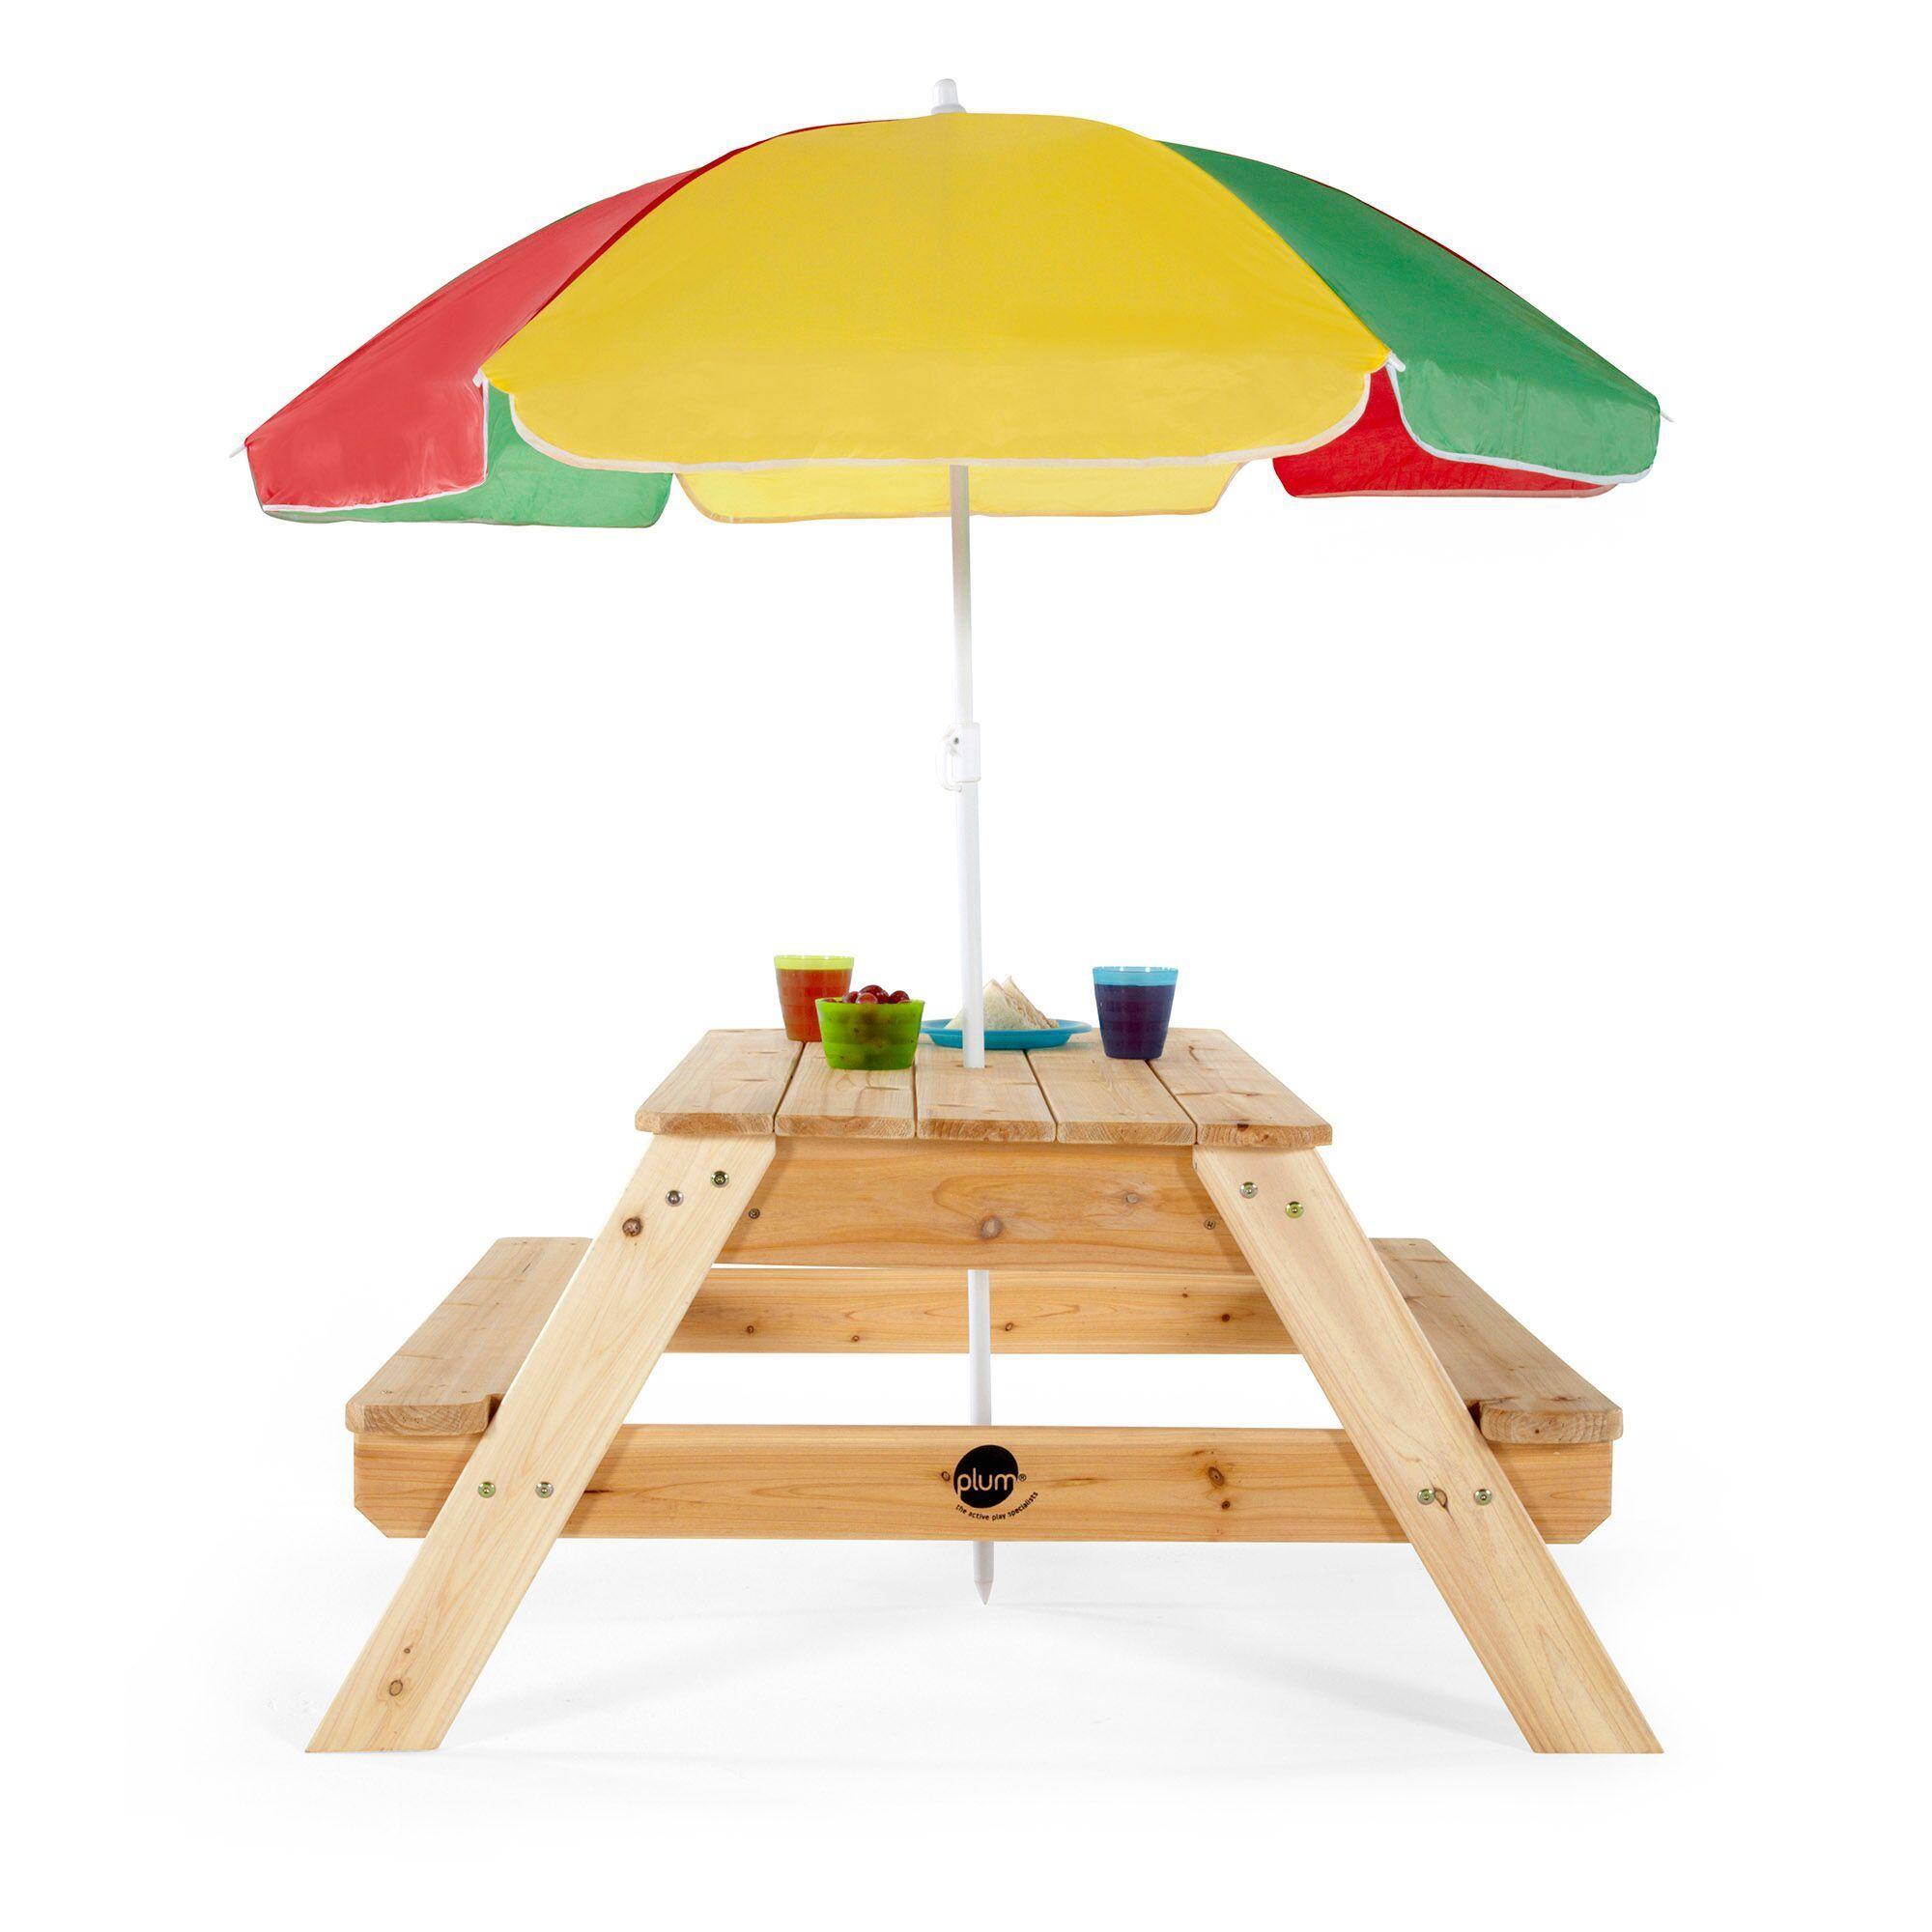 Plum Picnic Table With Umbrella Picnic Table With Umbrella